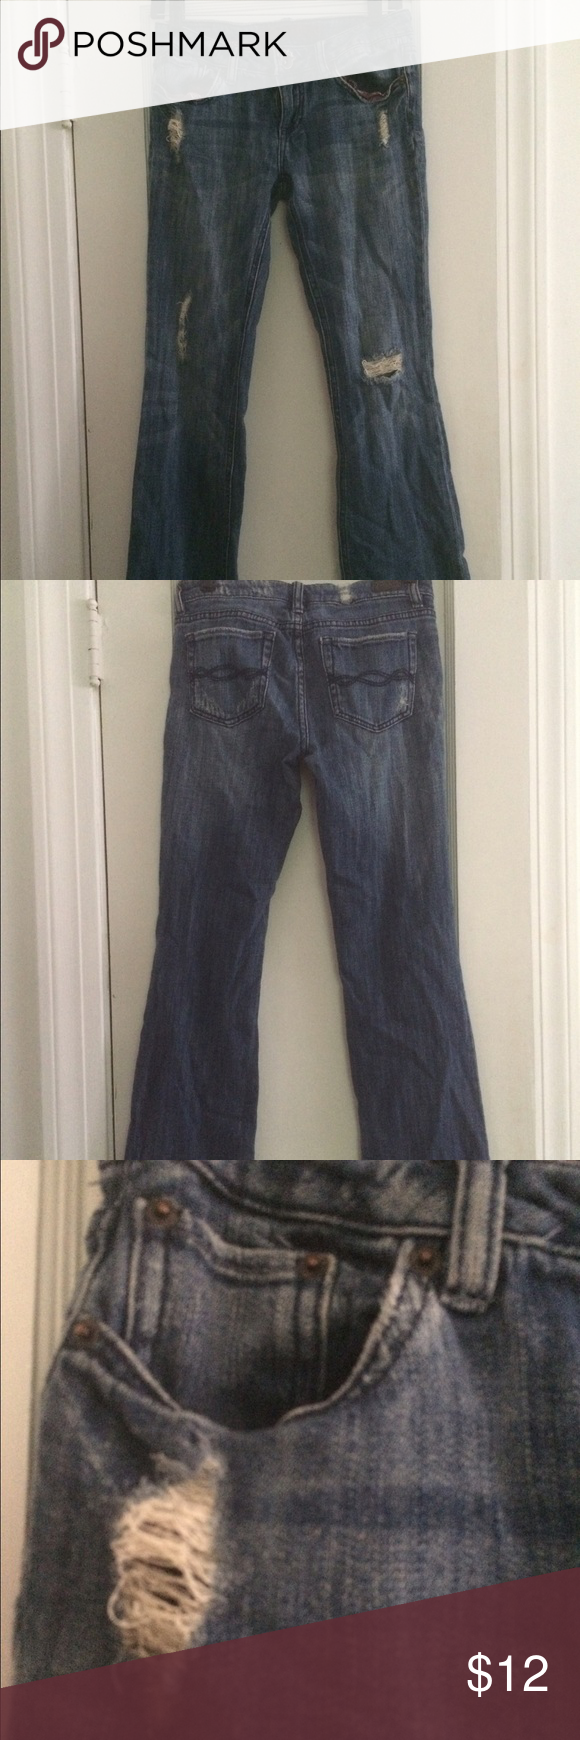 "Destroyed denim jeans 5 SHORT Destroyed denim jeans in great condition! 5 Short (I'm 5'3"") spandex cotton. Charlotte Russe Jeans"